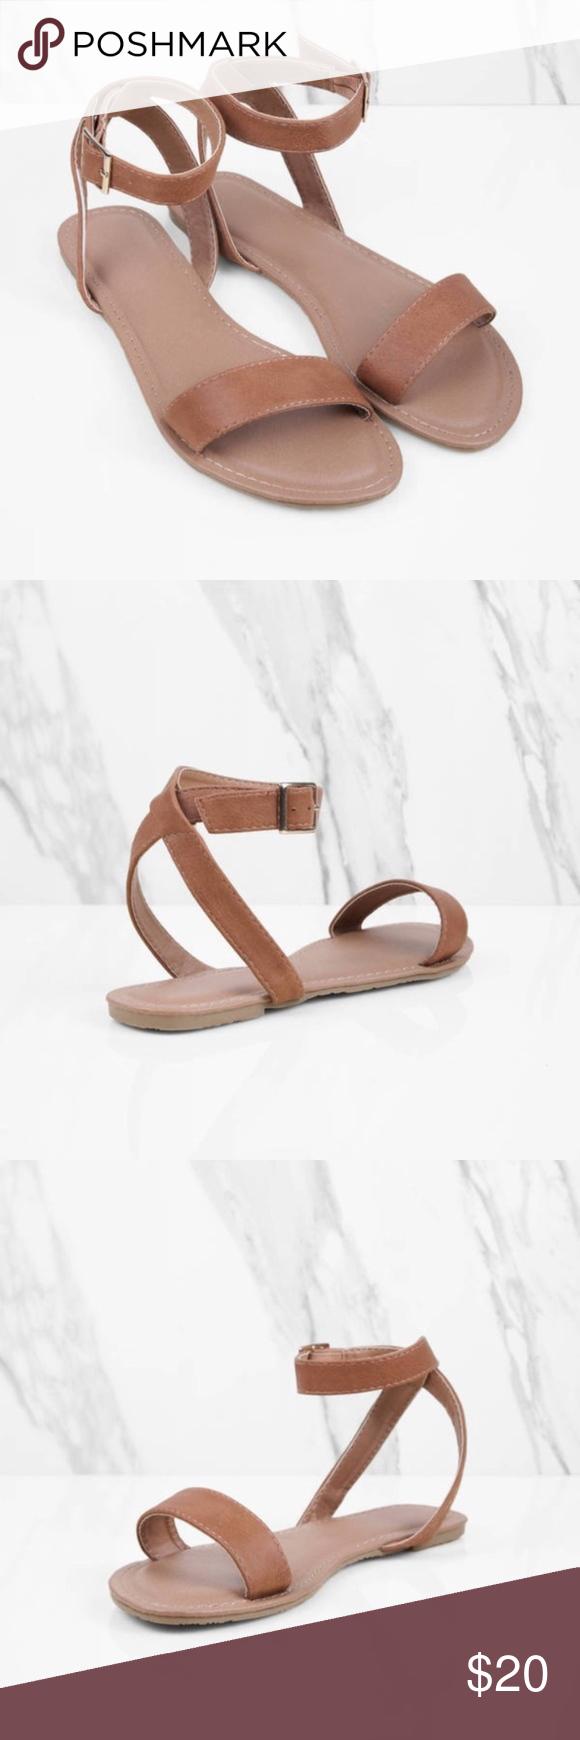 3824cfc7f534f3 Tobi Mocha Ankle Strap Sandals